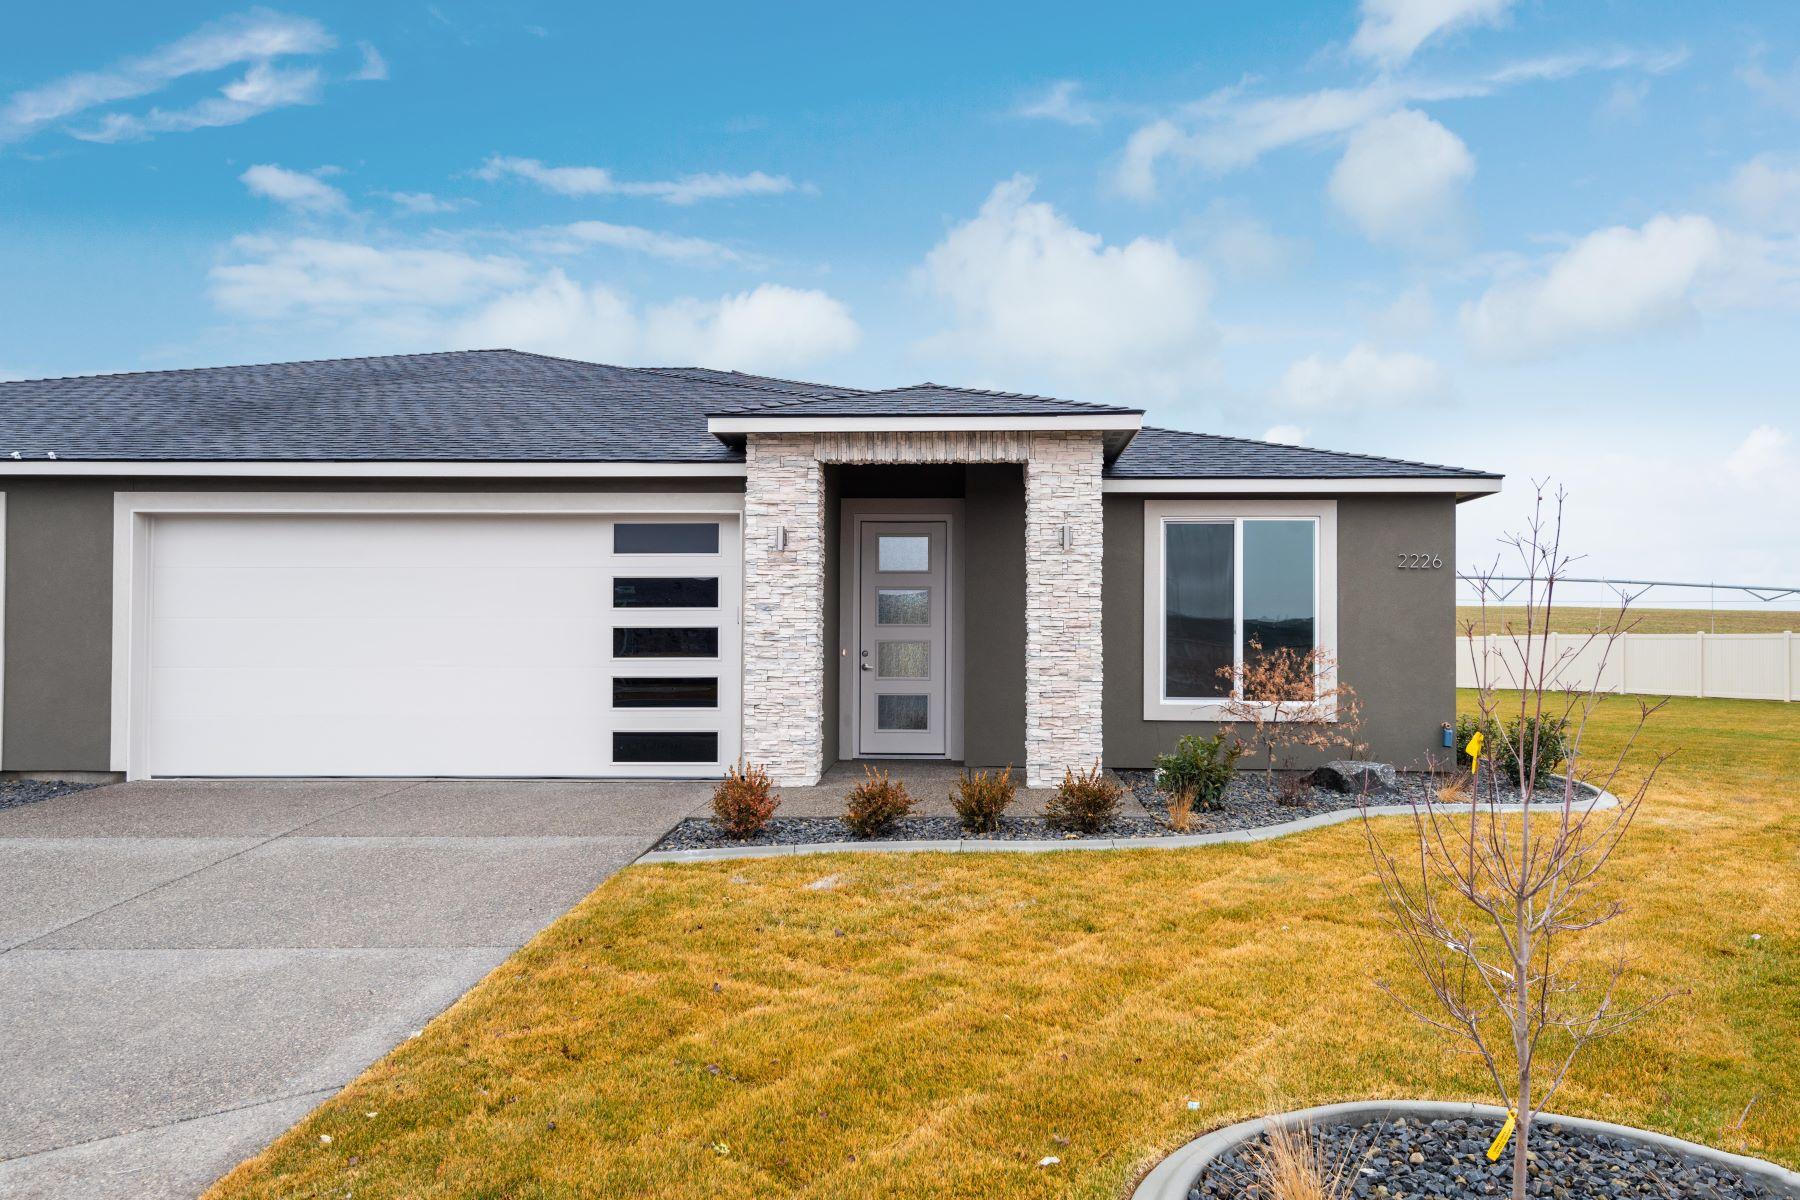 townhouses for Sale at Low Maintenance Golf Community 2268 Veneto Street, Richland, Washington 99352 United States